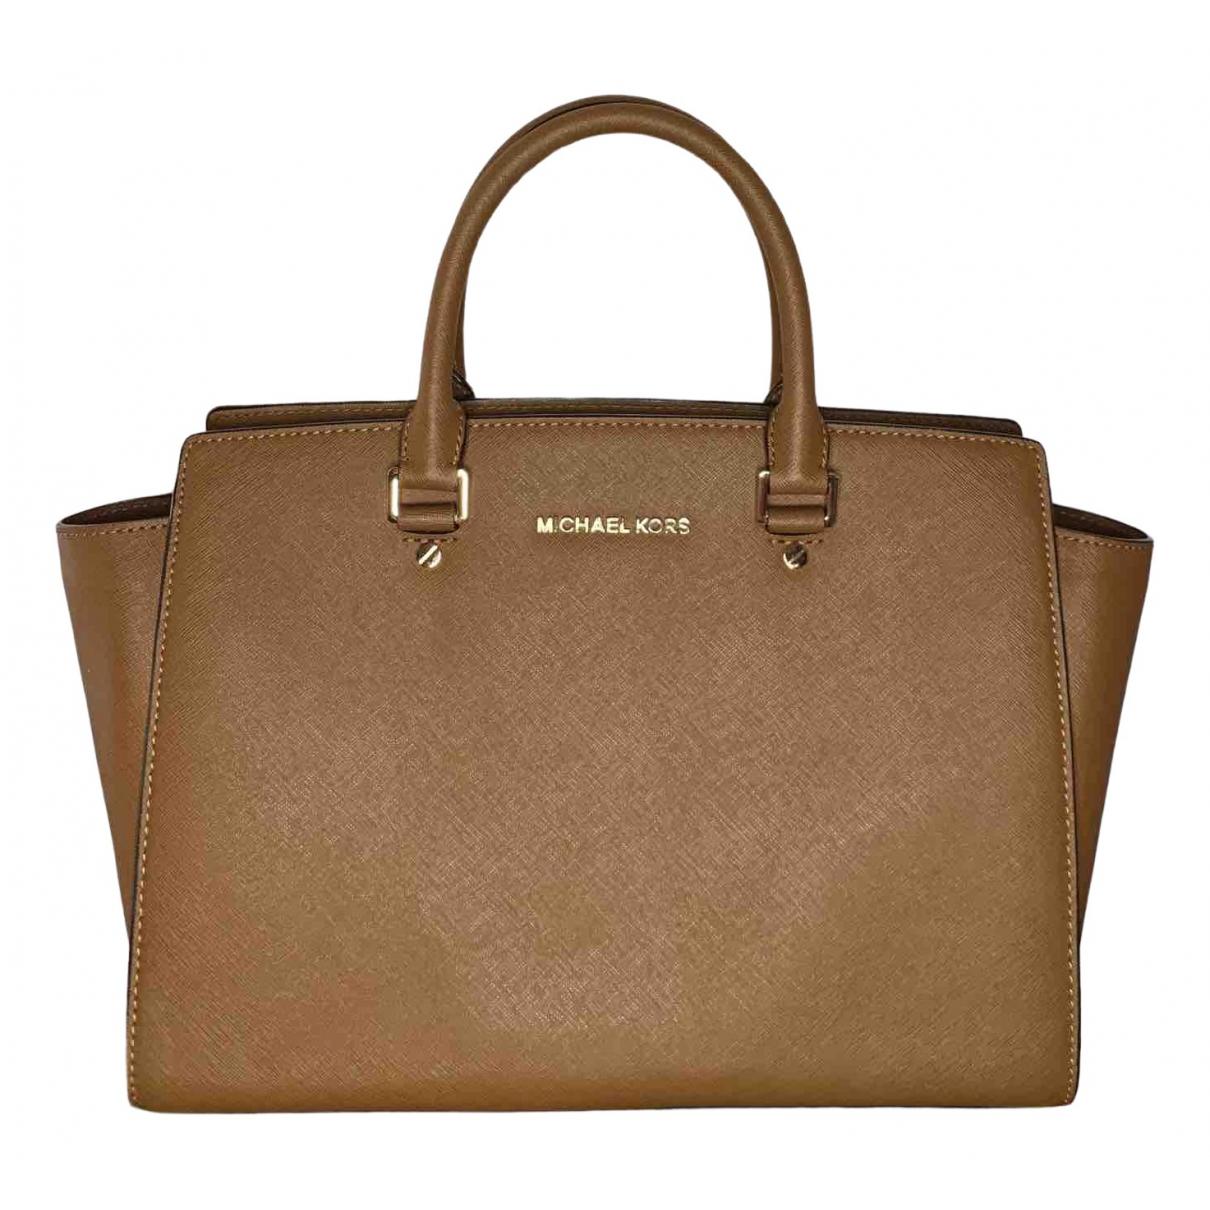 Michael Kors \N Brown Leather handbag for Women \N